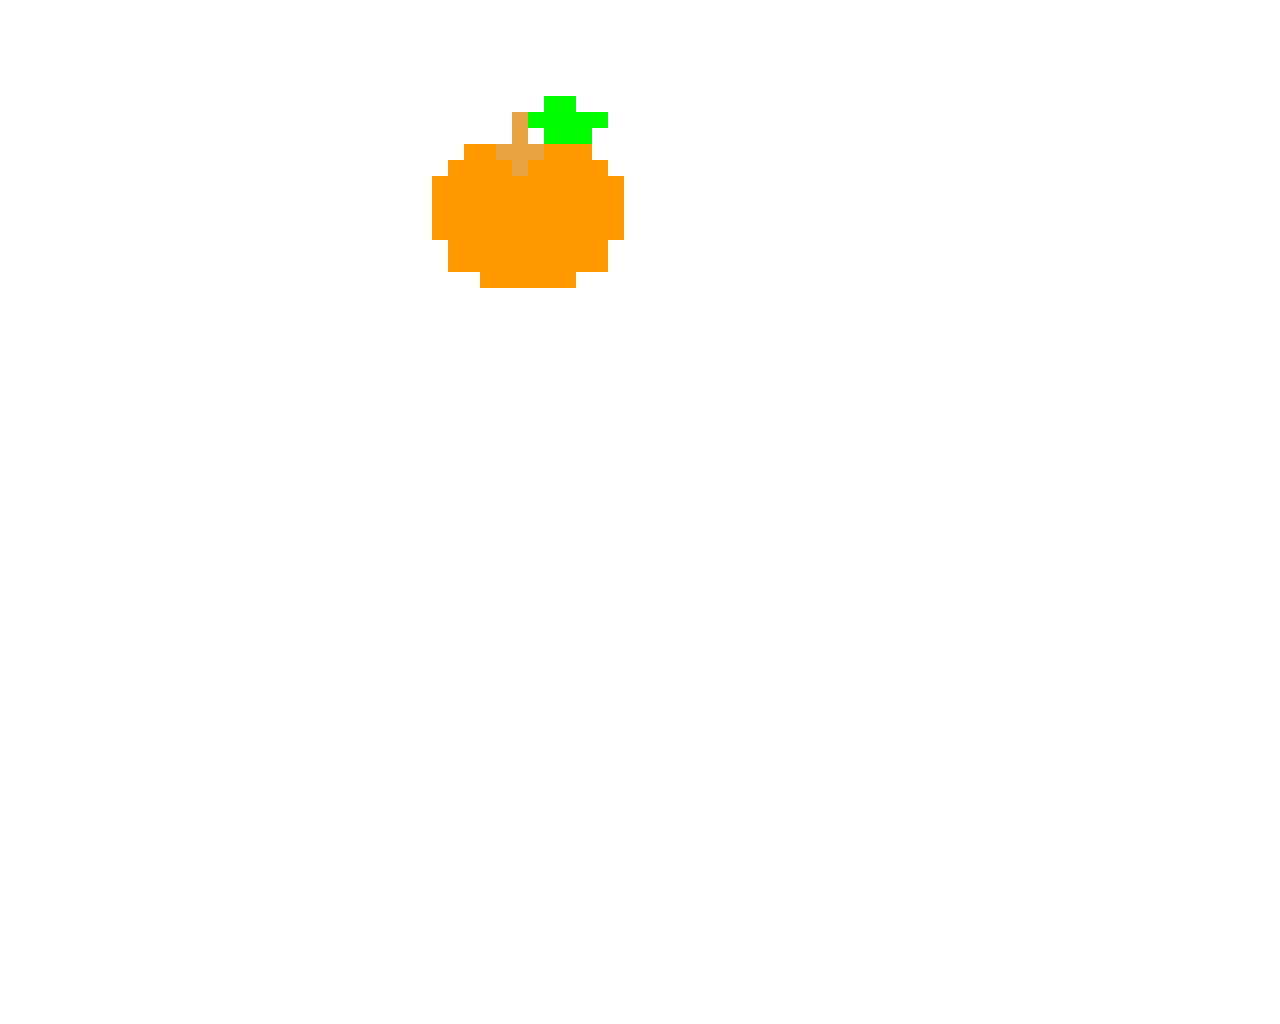 Orange pac man bonus item